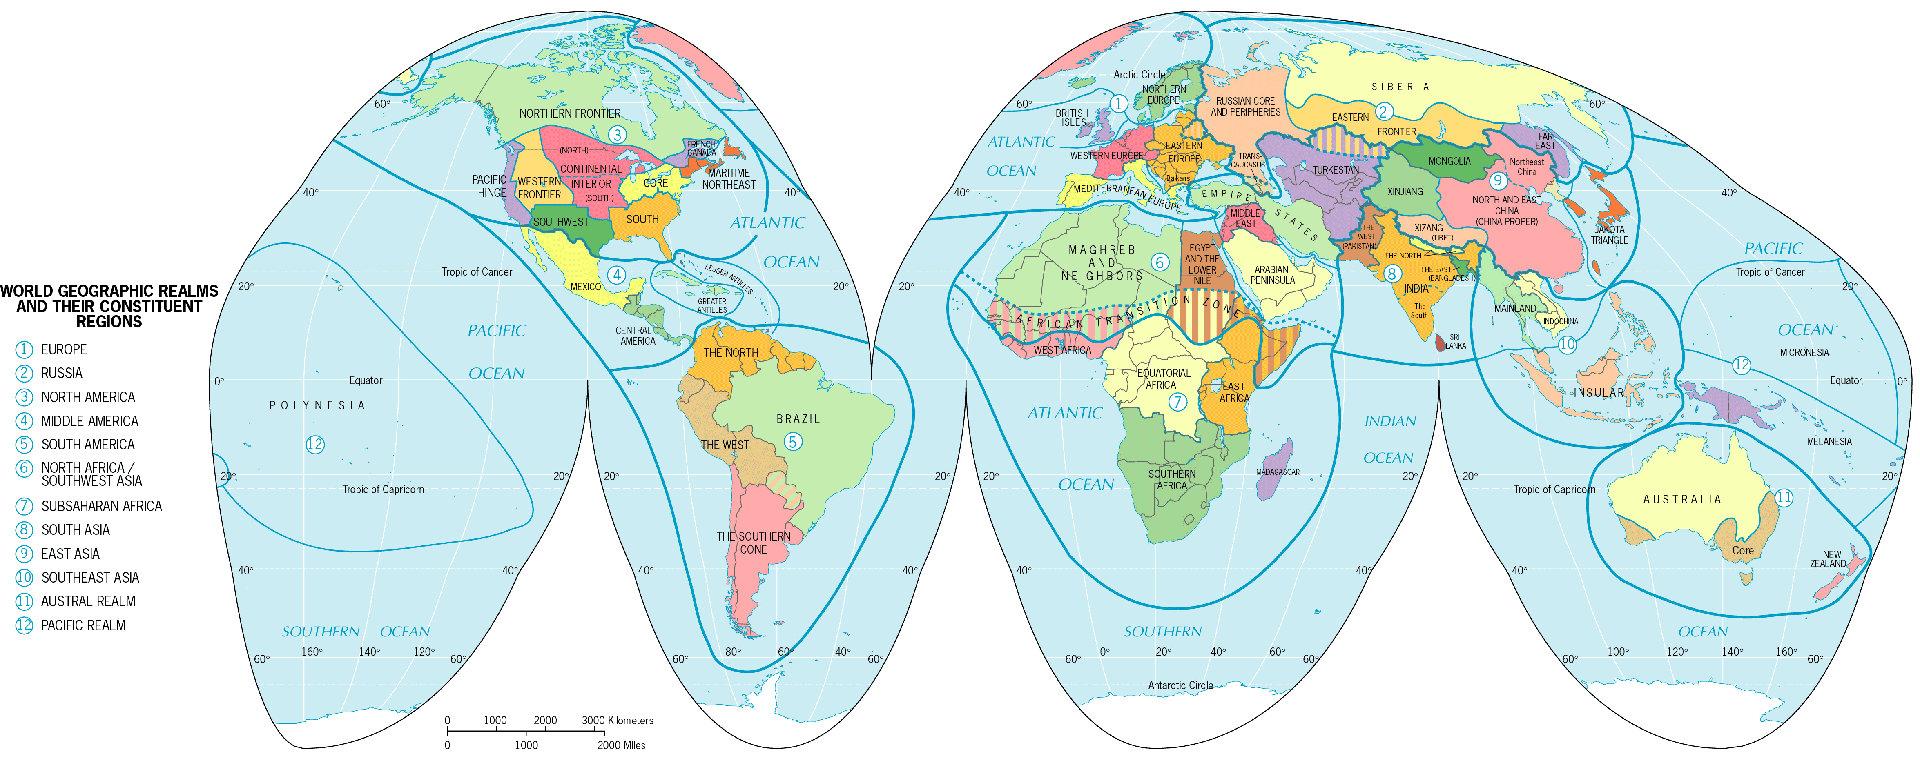 Географическая карта мира: http://sevia.ru/geograficheskaja-karta-mira.shtml